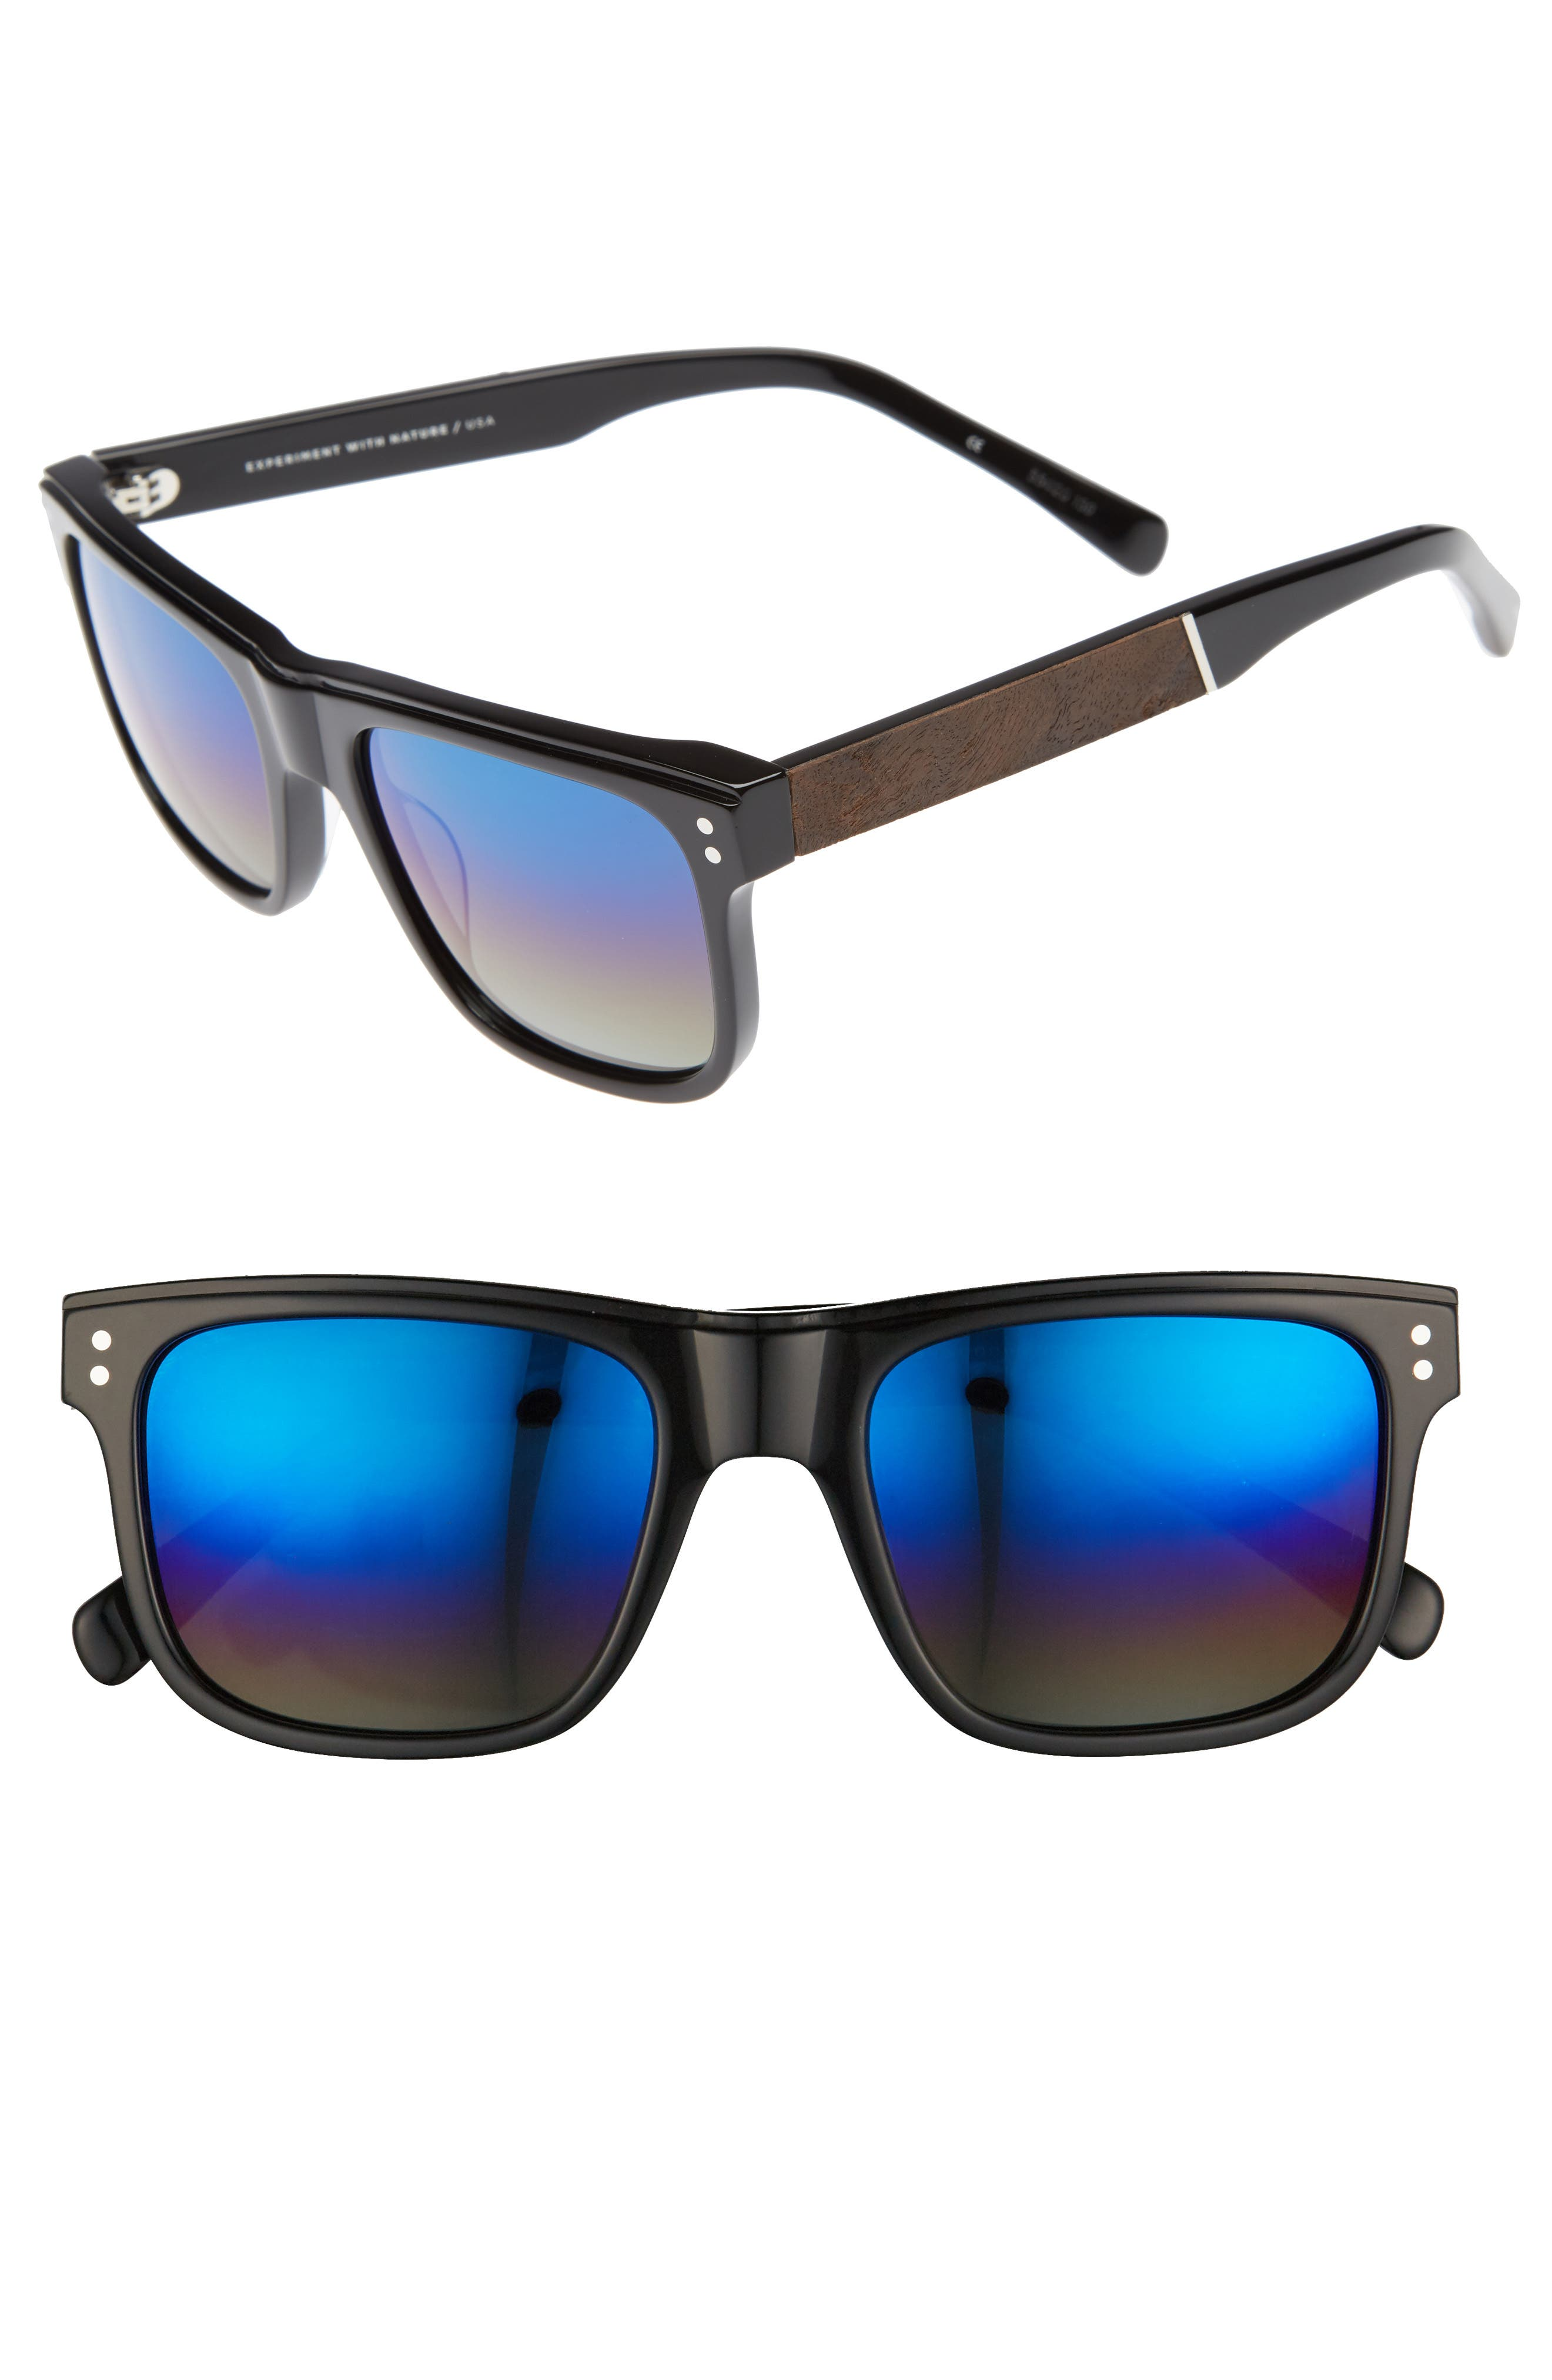 Monroe 55mm Polarized Sunglasses,                             Main thumbnail 1, color,                             001